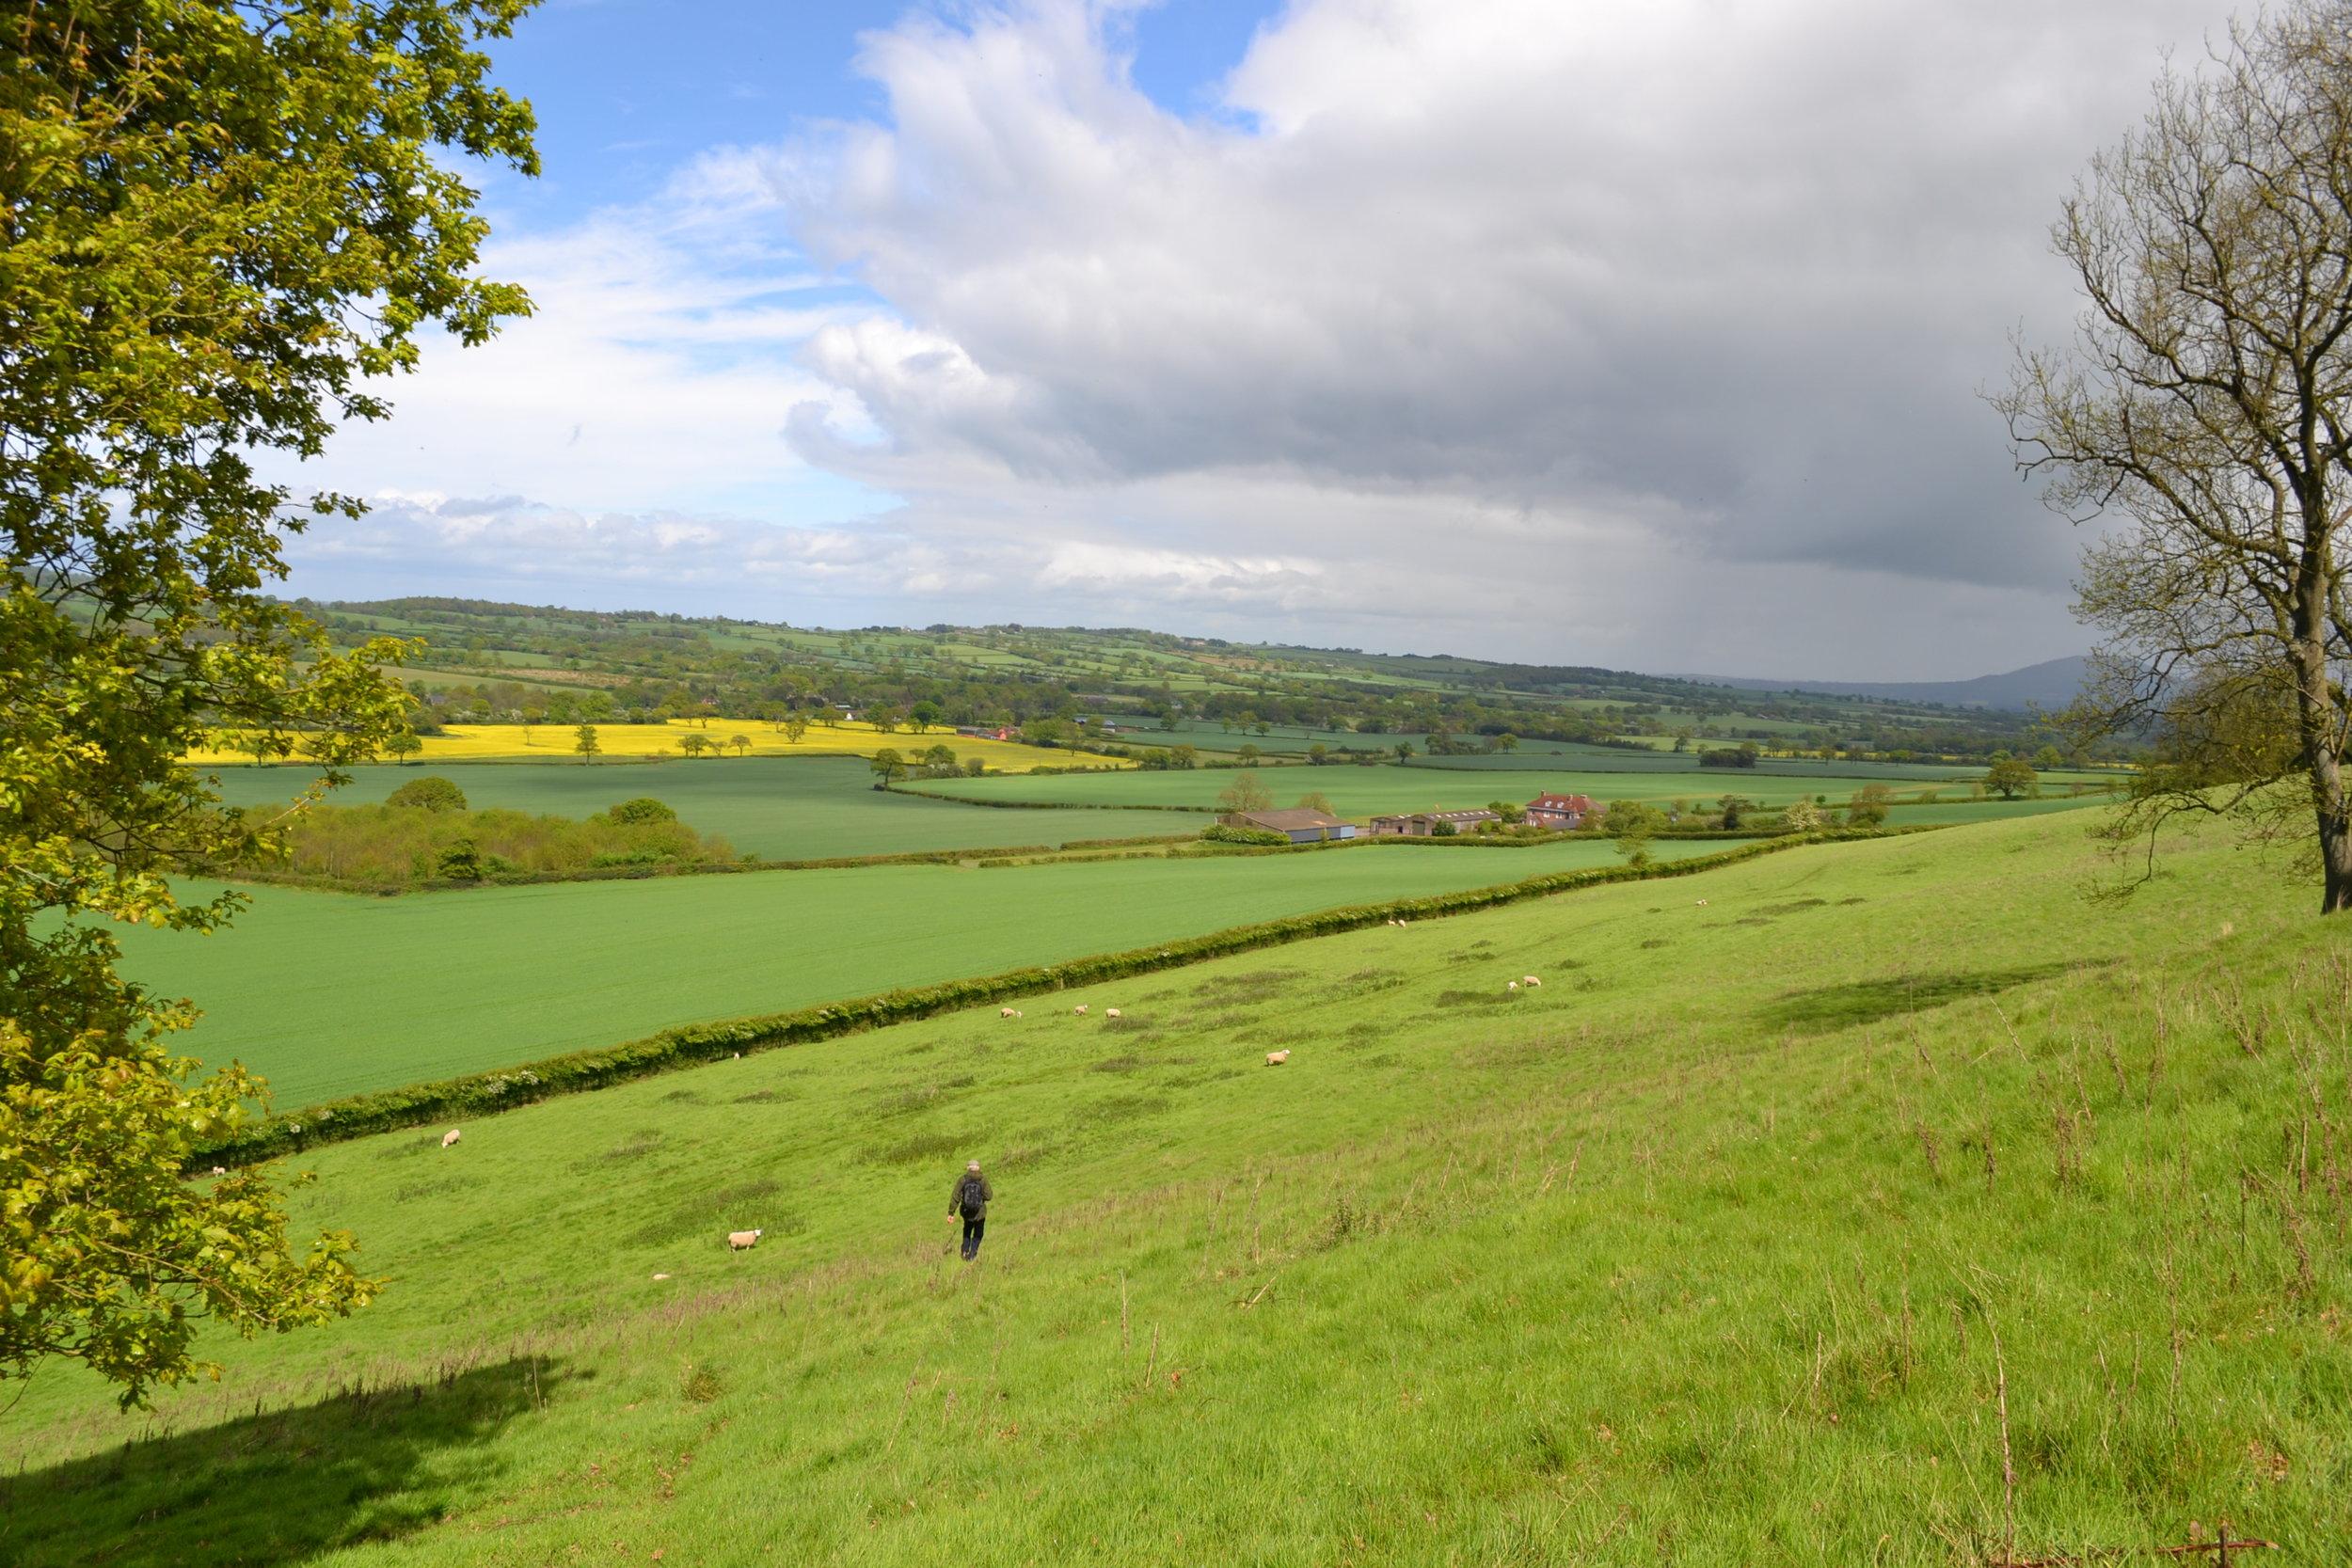 Country walking along scenic wenlock edge